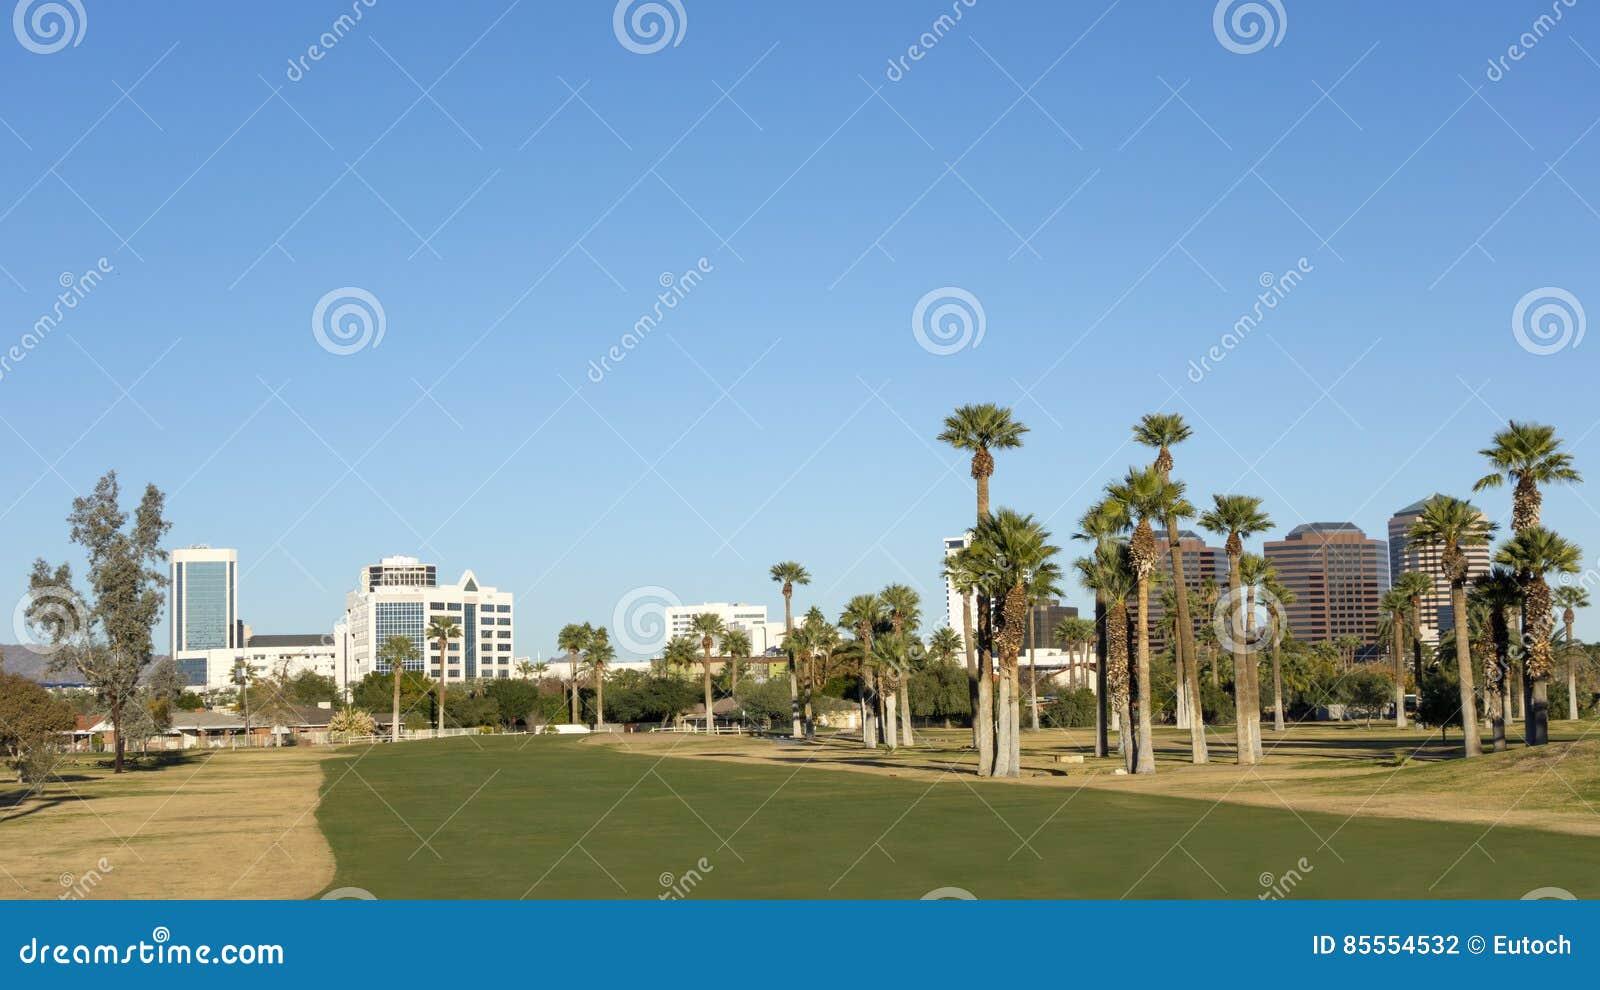 Grüne Golfplatz-Rasen in Phoenix im Stadtzentrum gelegen, AZ